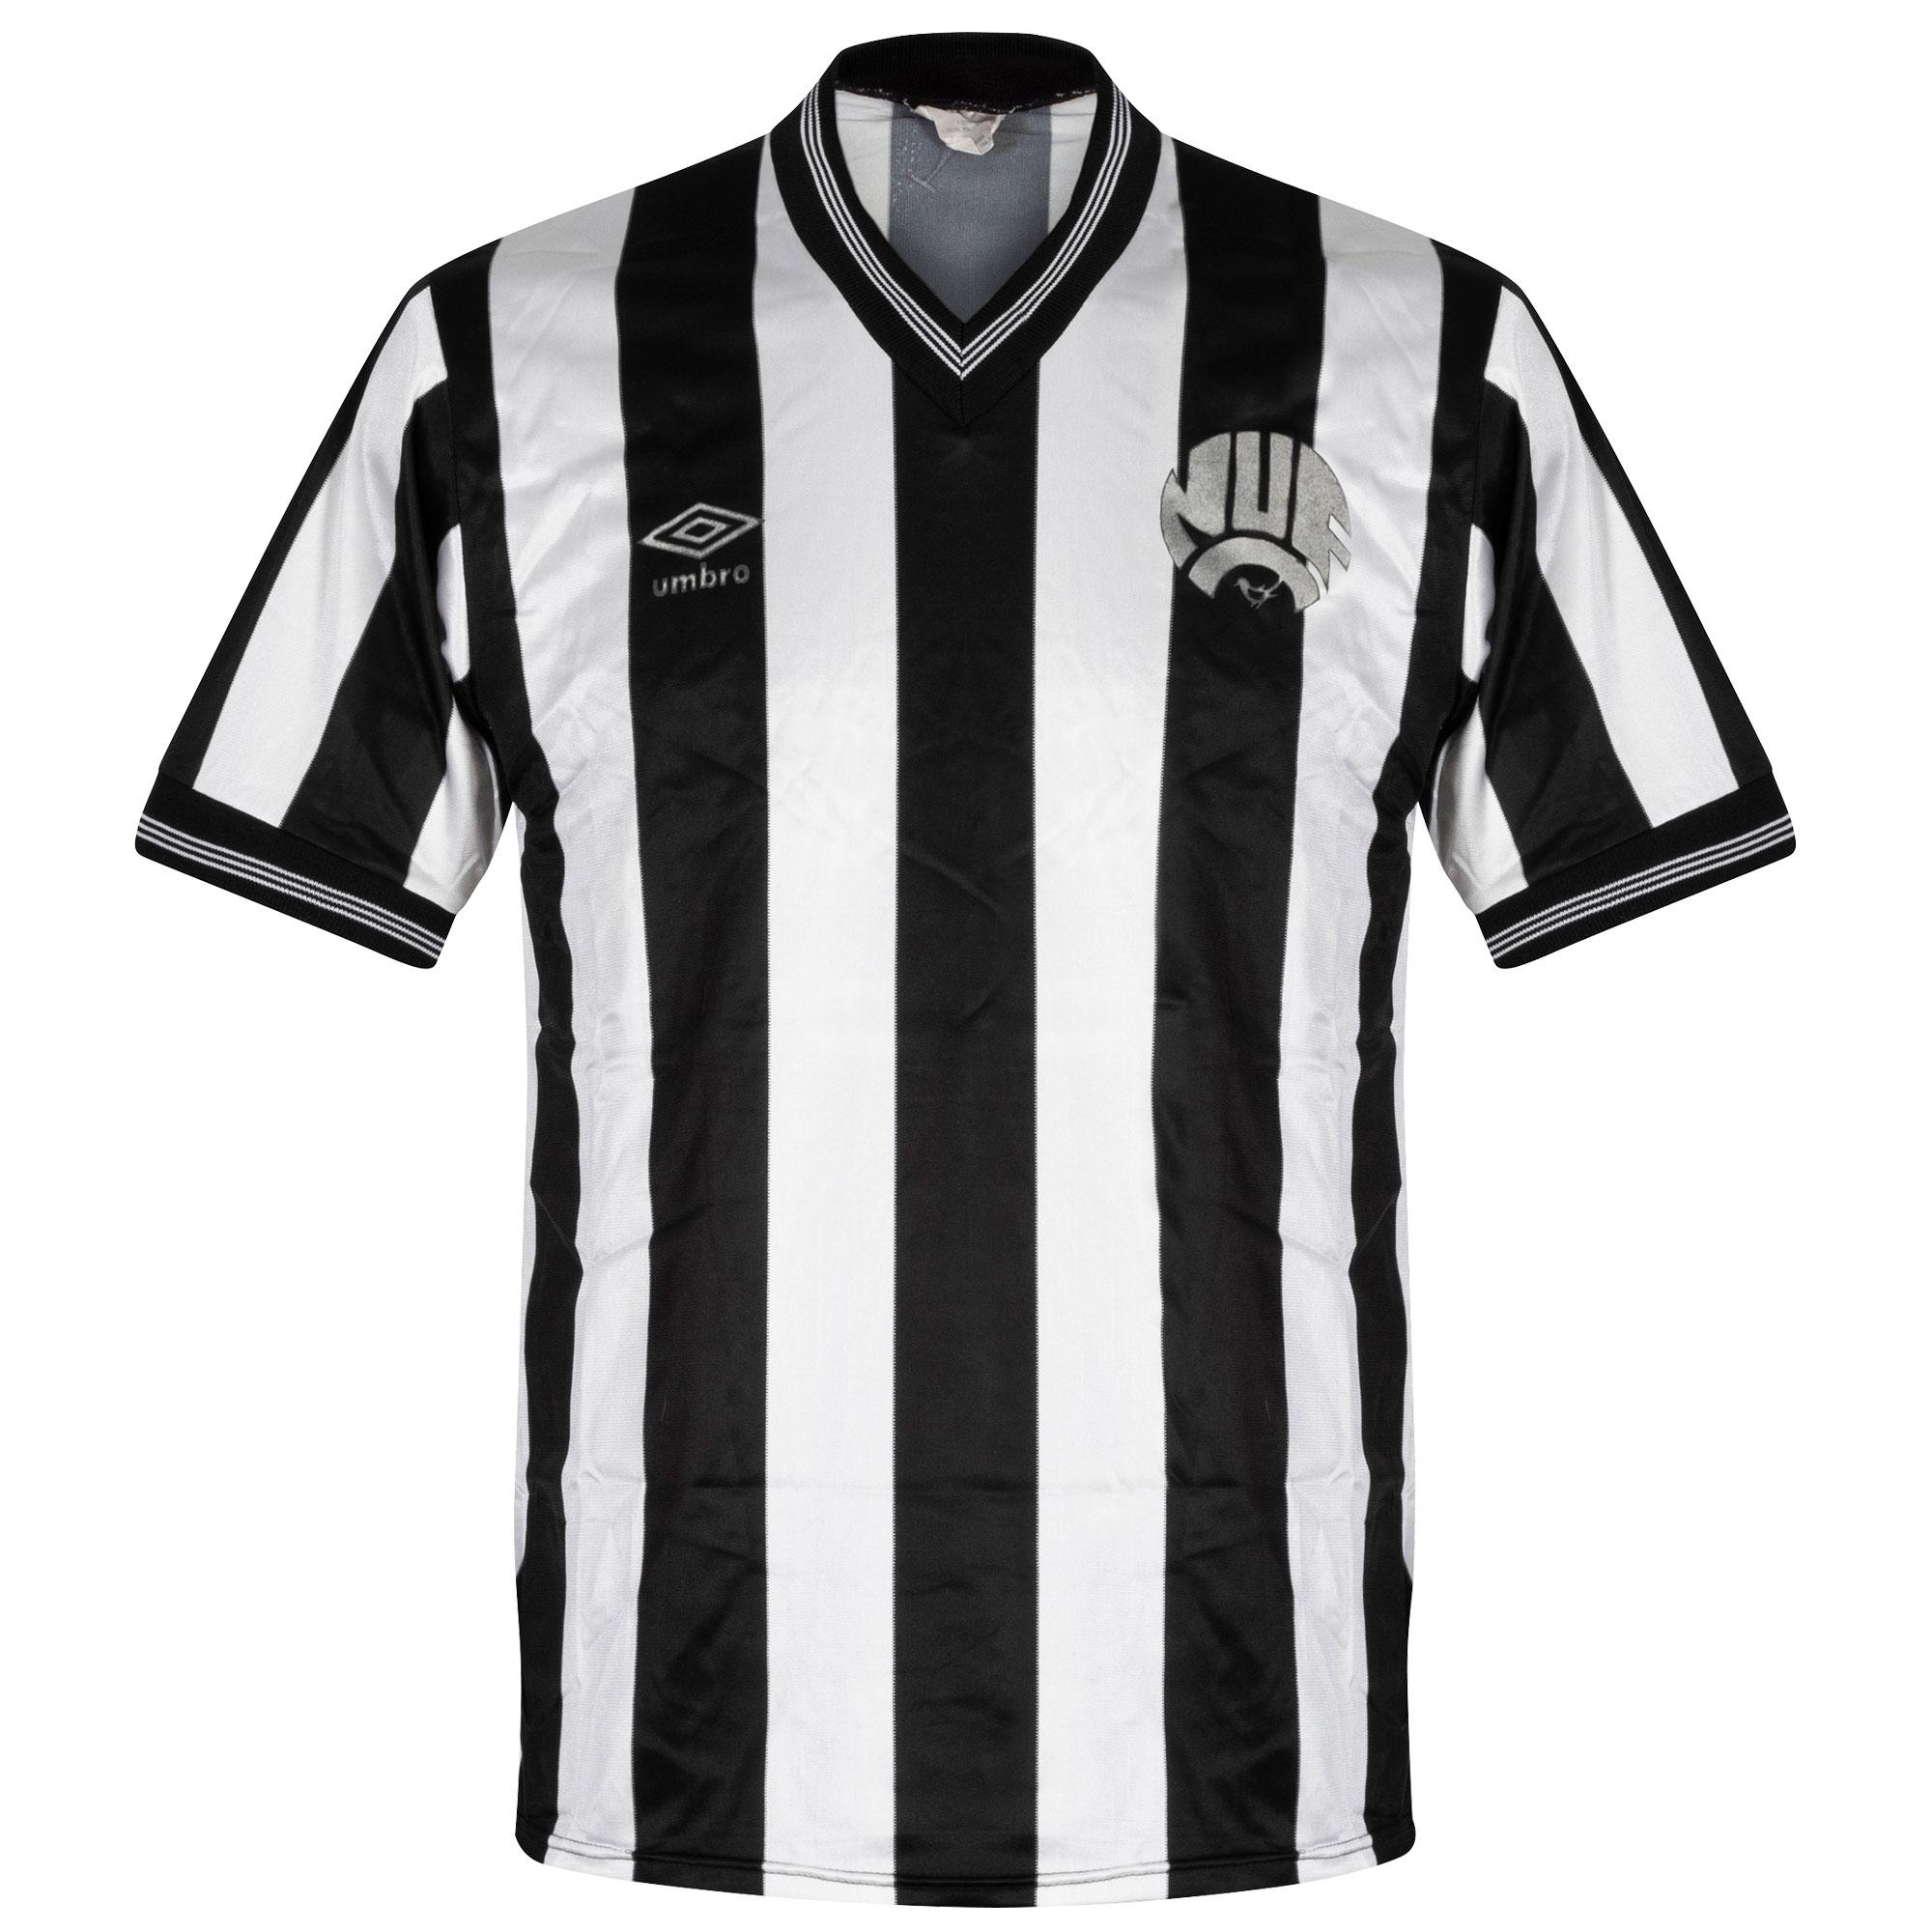 Umbro Newcastle United 1983-1987 Home Shirt- USED Condition (Good) - Extremely Rare - Size Medium